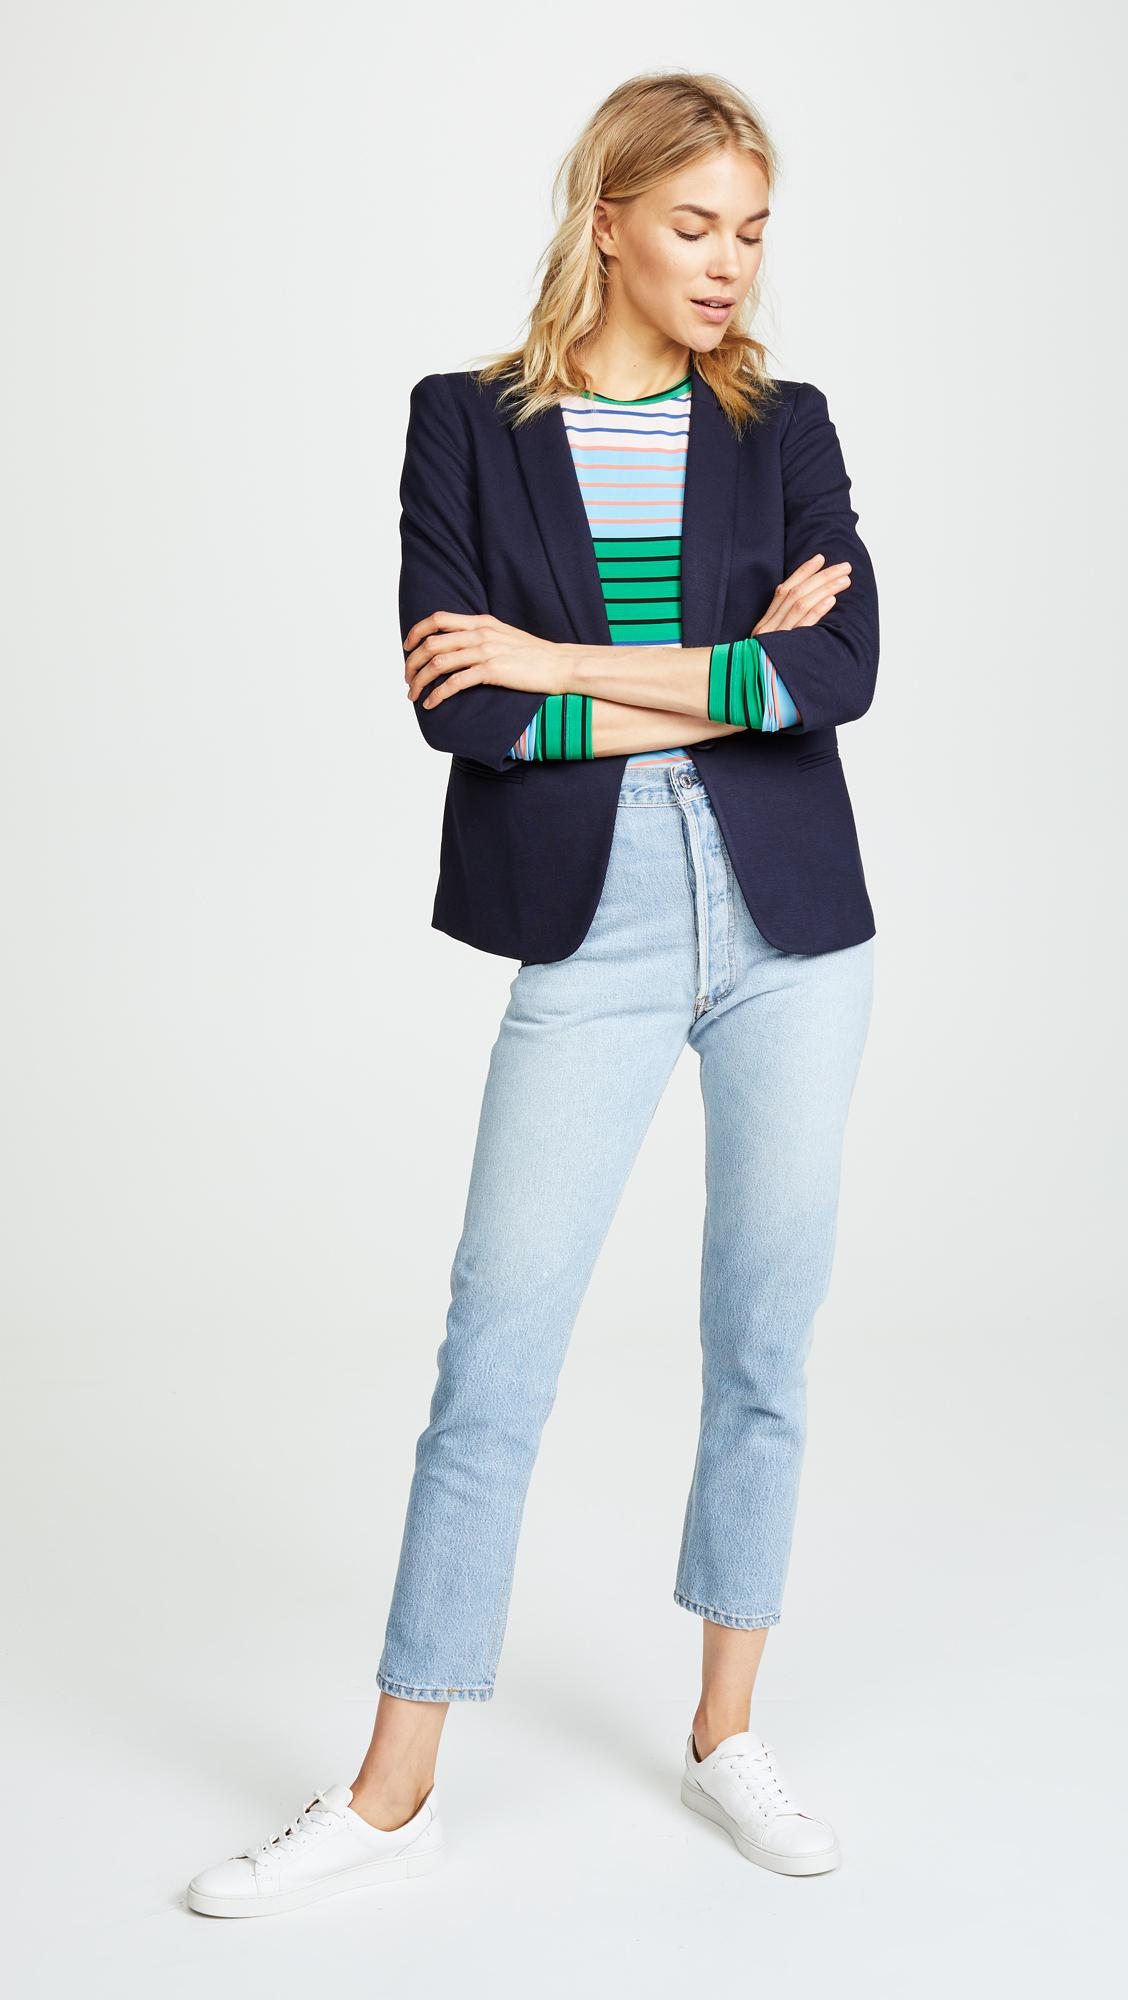 James Jeans Synthetic Shrunken One-button Tuxedo Jacket, Navy in Blue